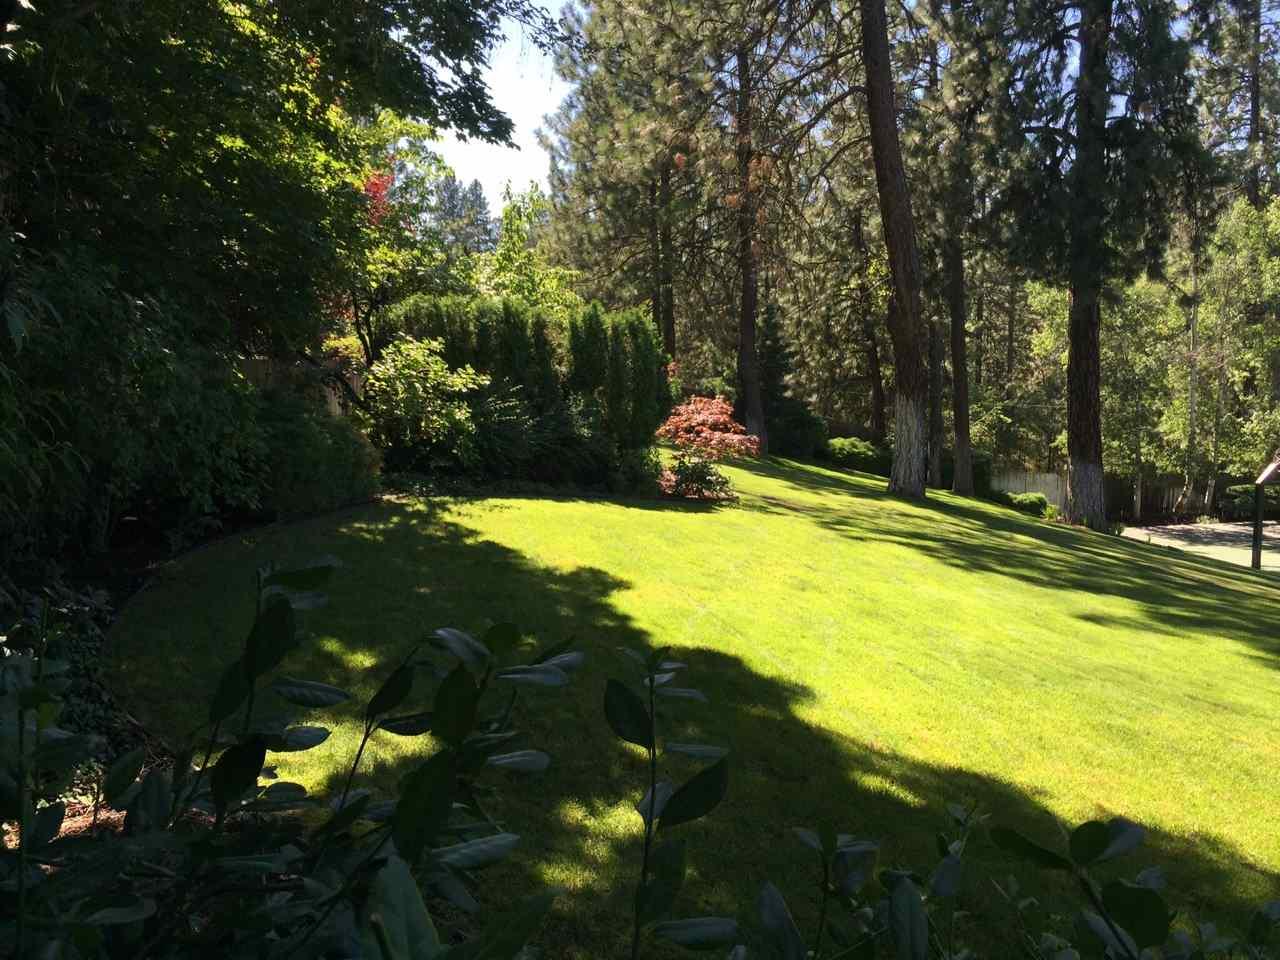 1612 S Crest Hill Dr , Spokane, WA - USA (photo 1)